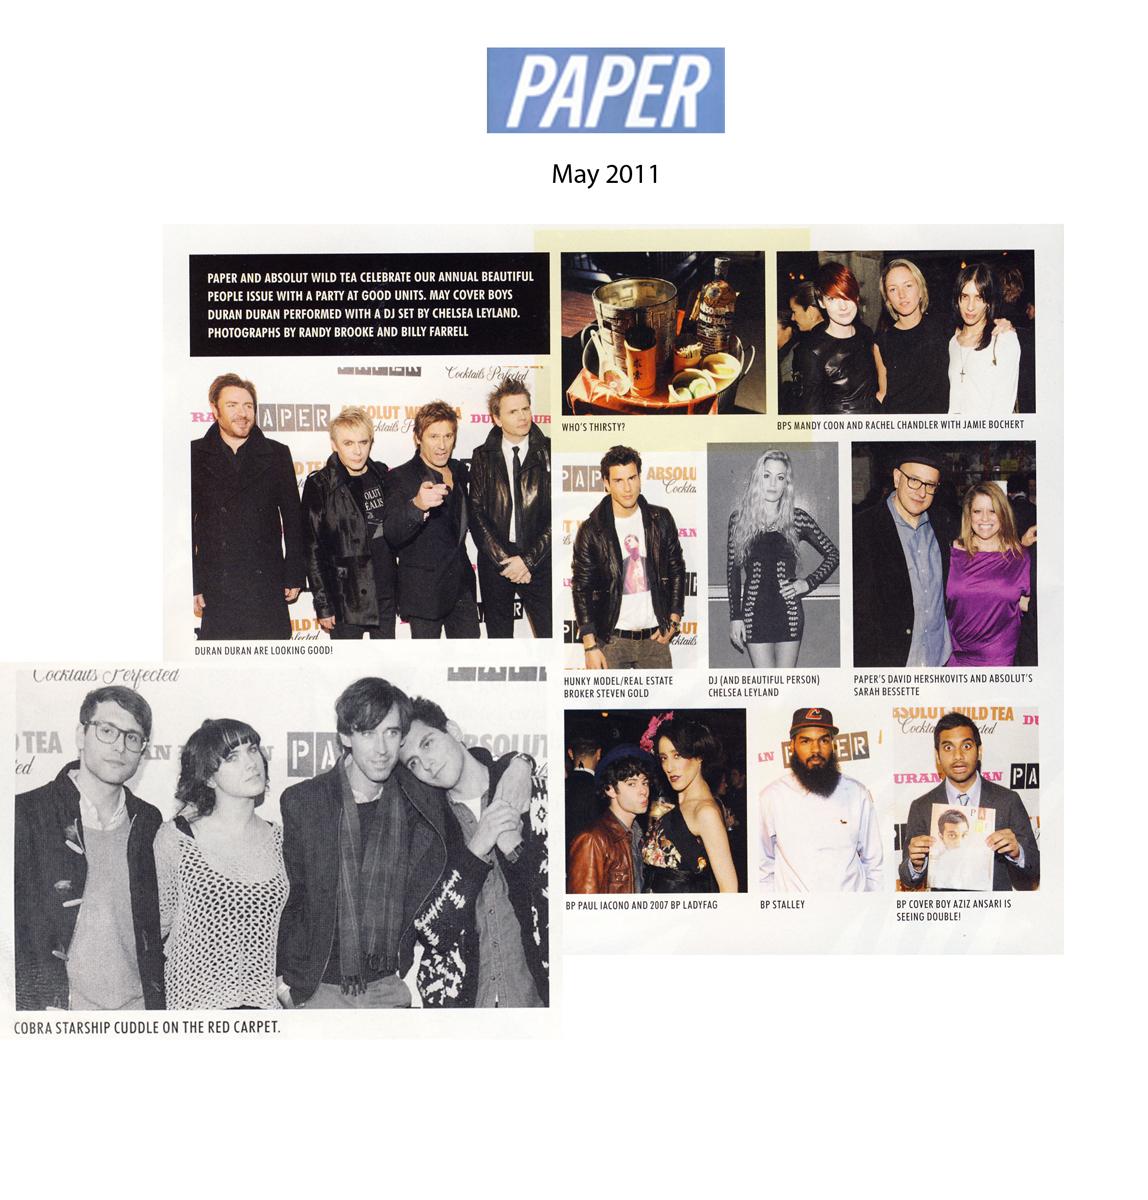 Cobra Starship - Paper - May 2011.jpg